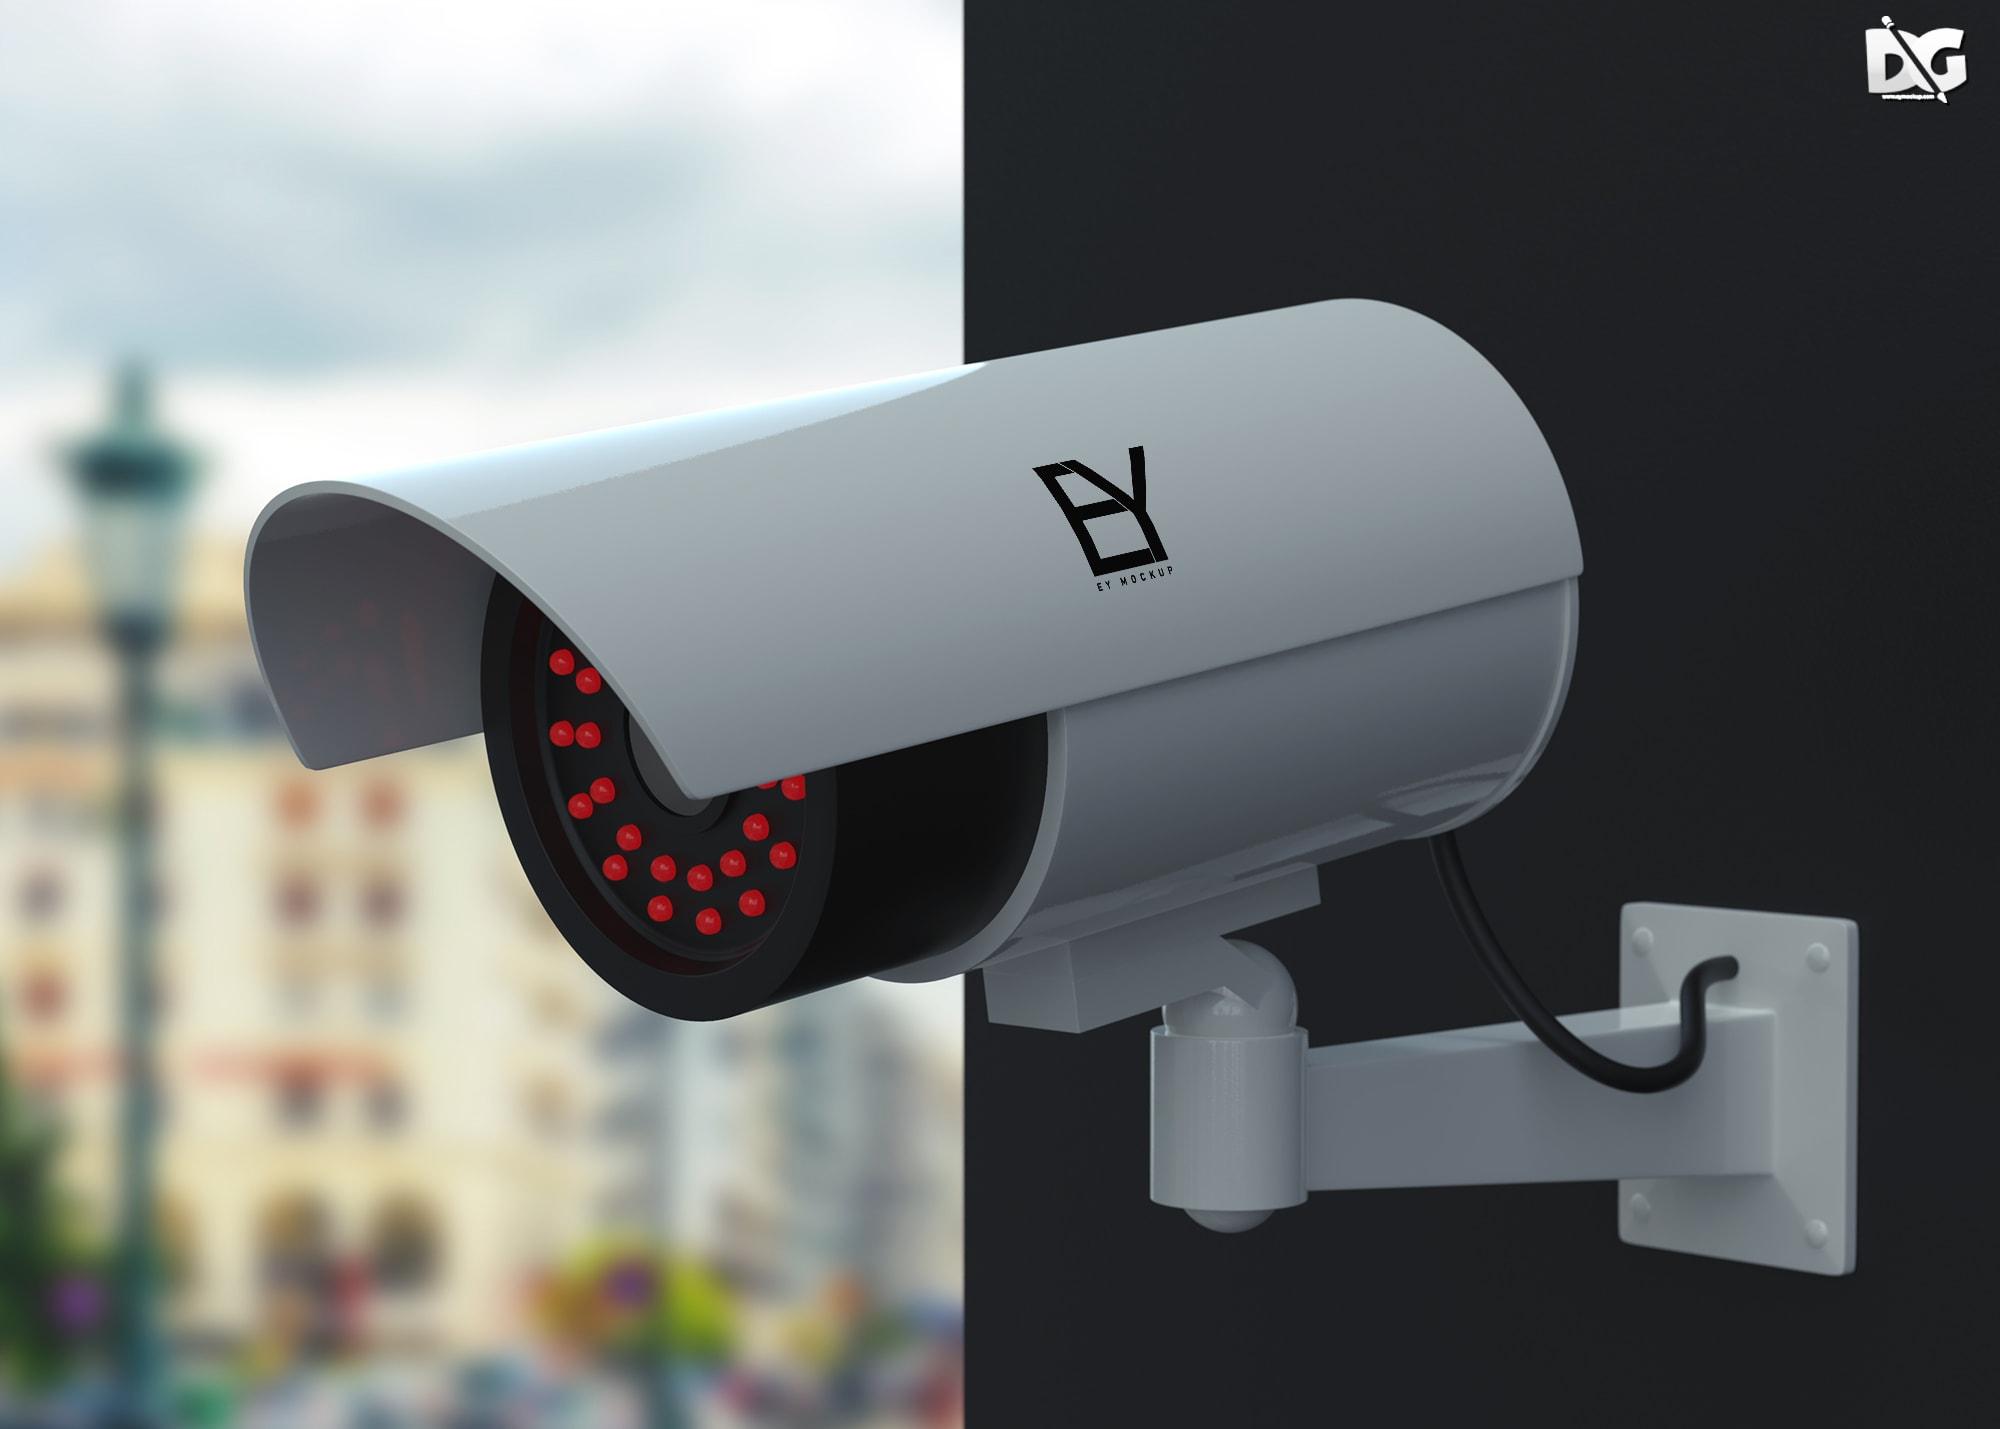 Free Security Camera Mockup